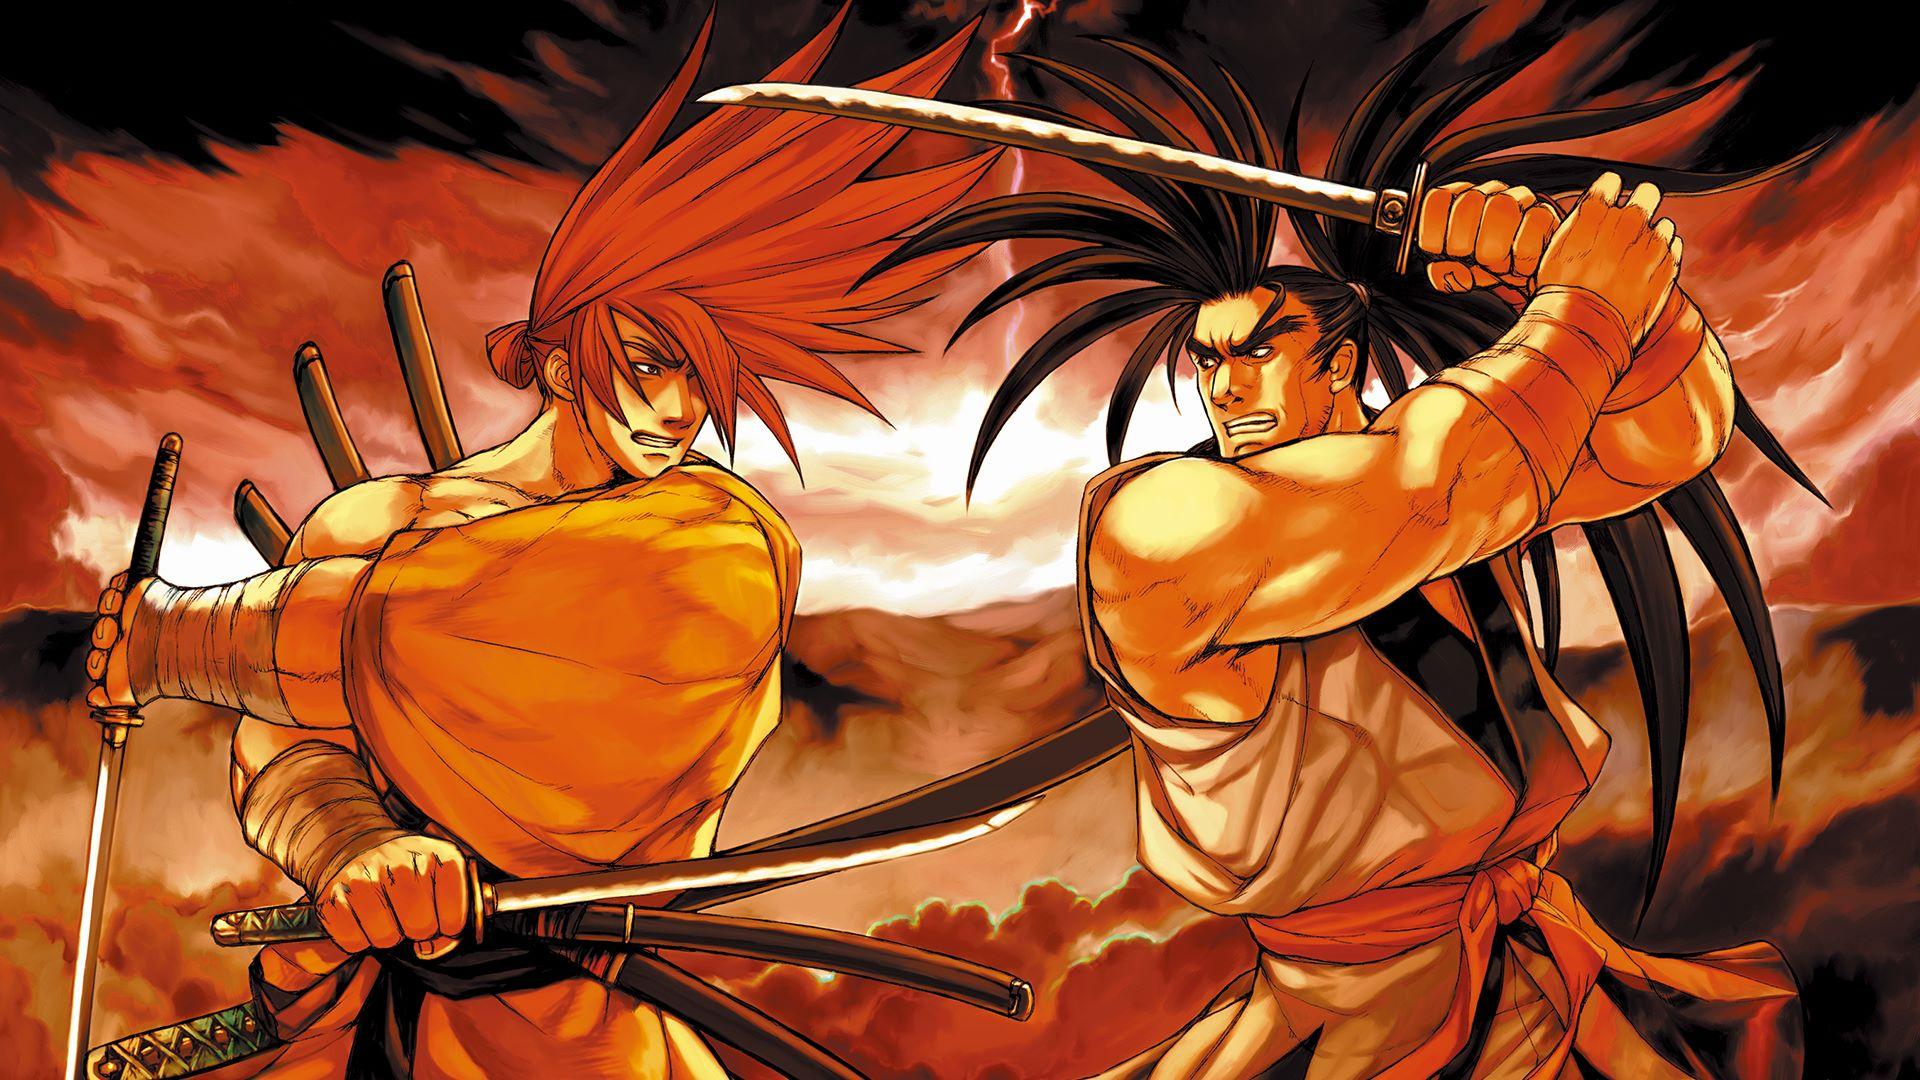 samurai-shodown-se-lanzara-en-xbox-one-frikigamers.com